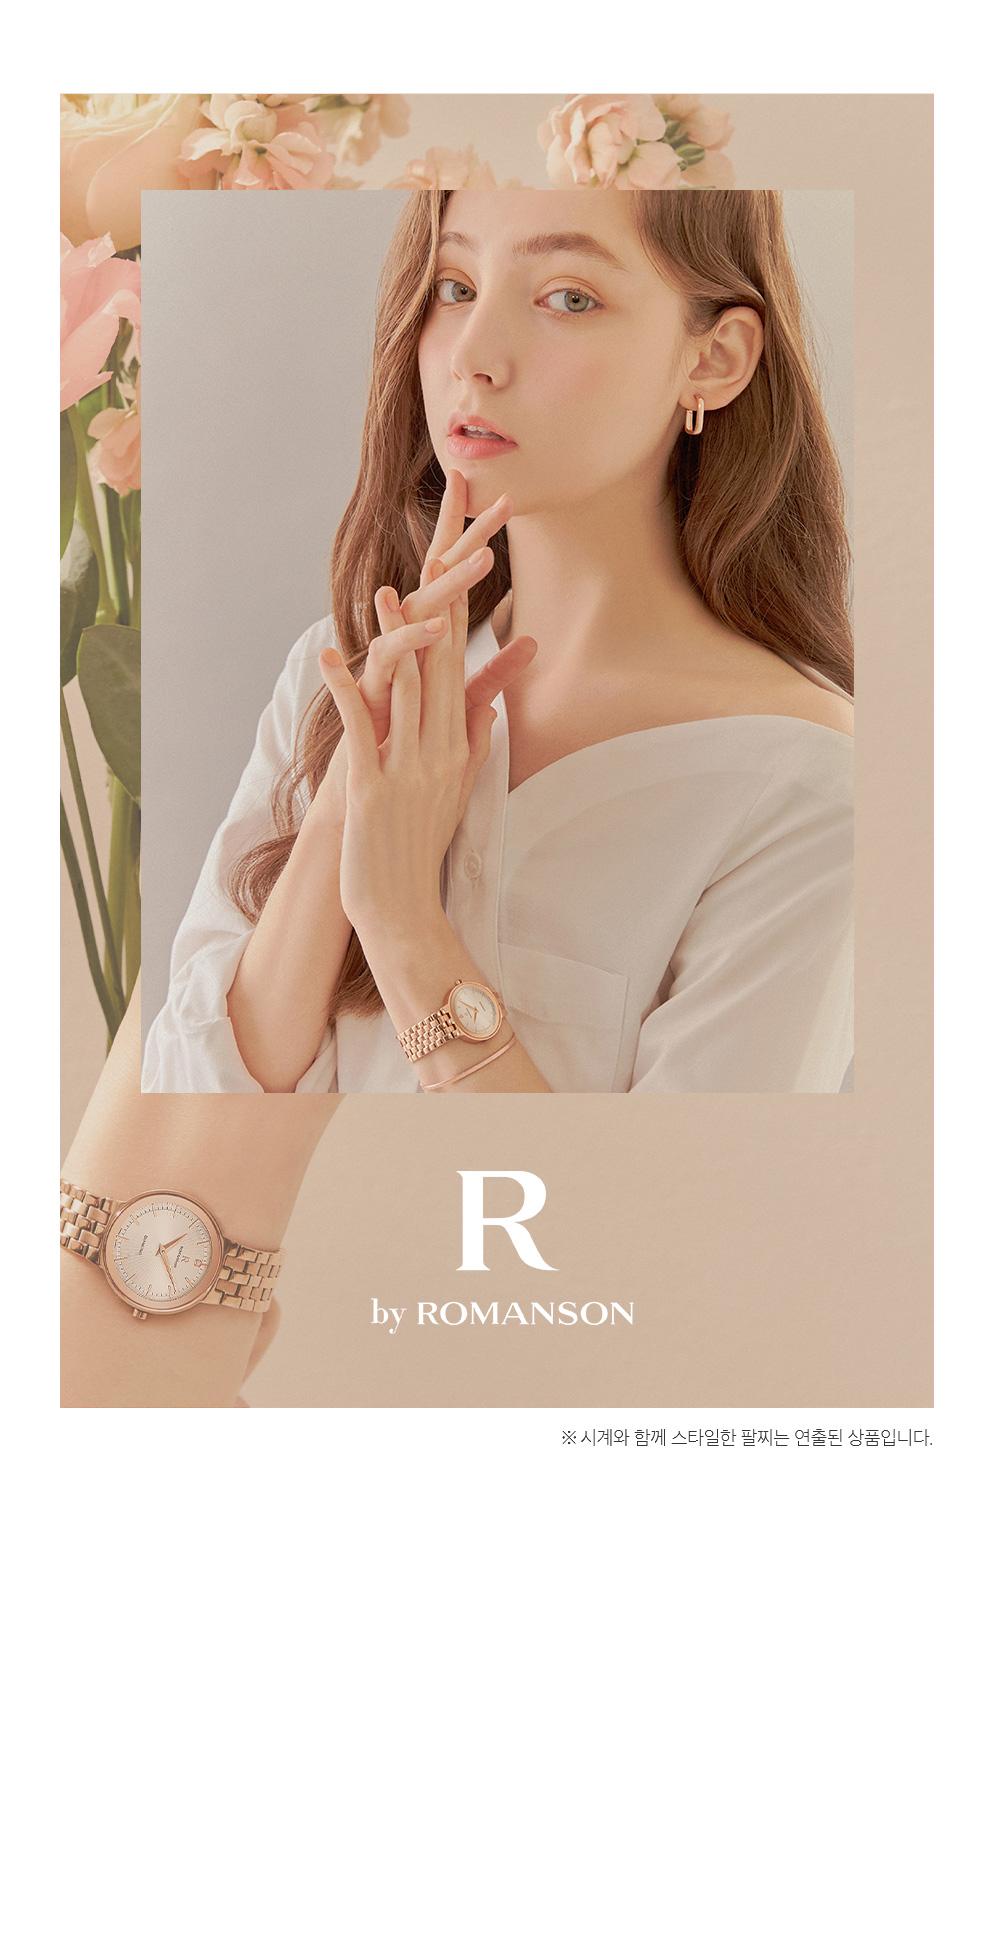 RWRMLL0B1900RGCR0_M